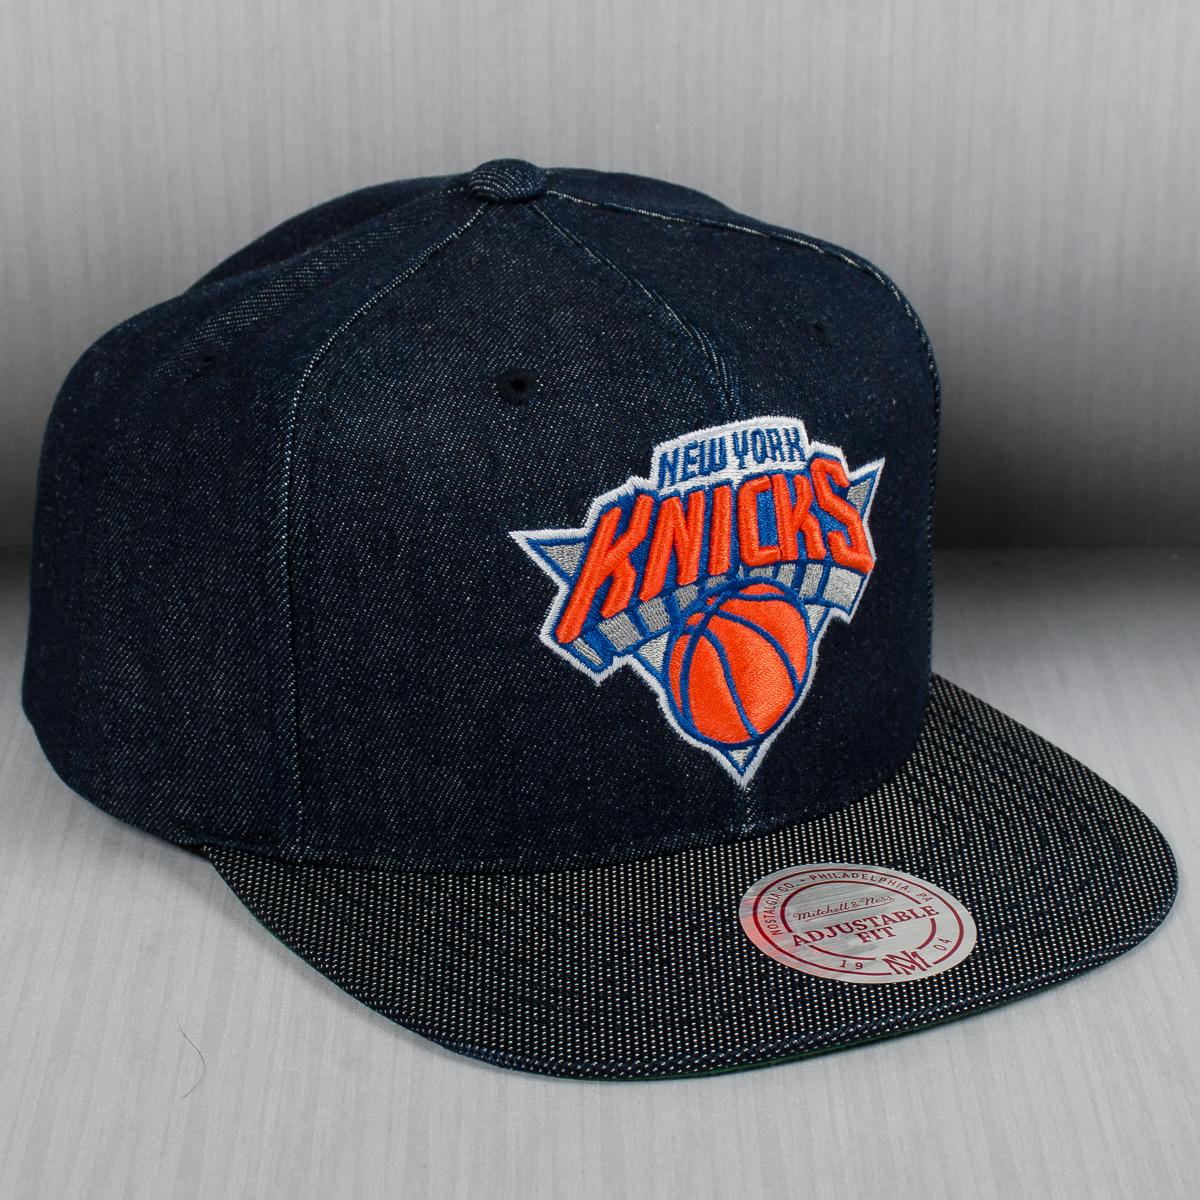 timeless design 216d0 81b90 Mitchell   Ness NBA New York Knicks Raw Denim Snapback Cap - NBA Shop New  York Knicks Merchandise - Superfanas.lt